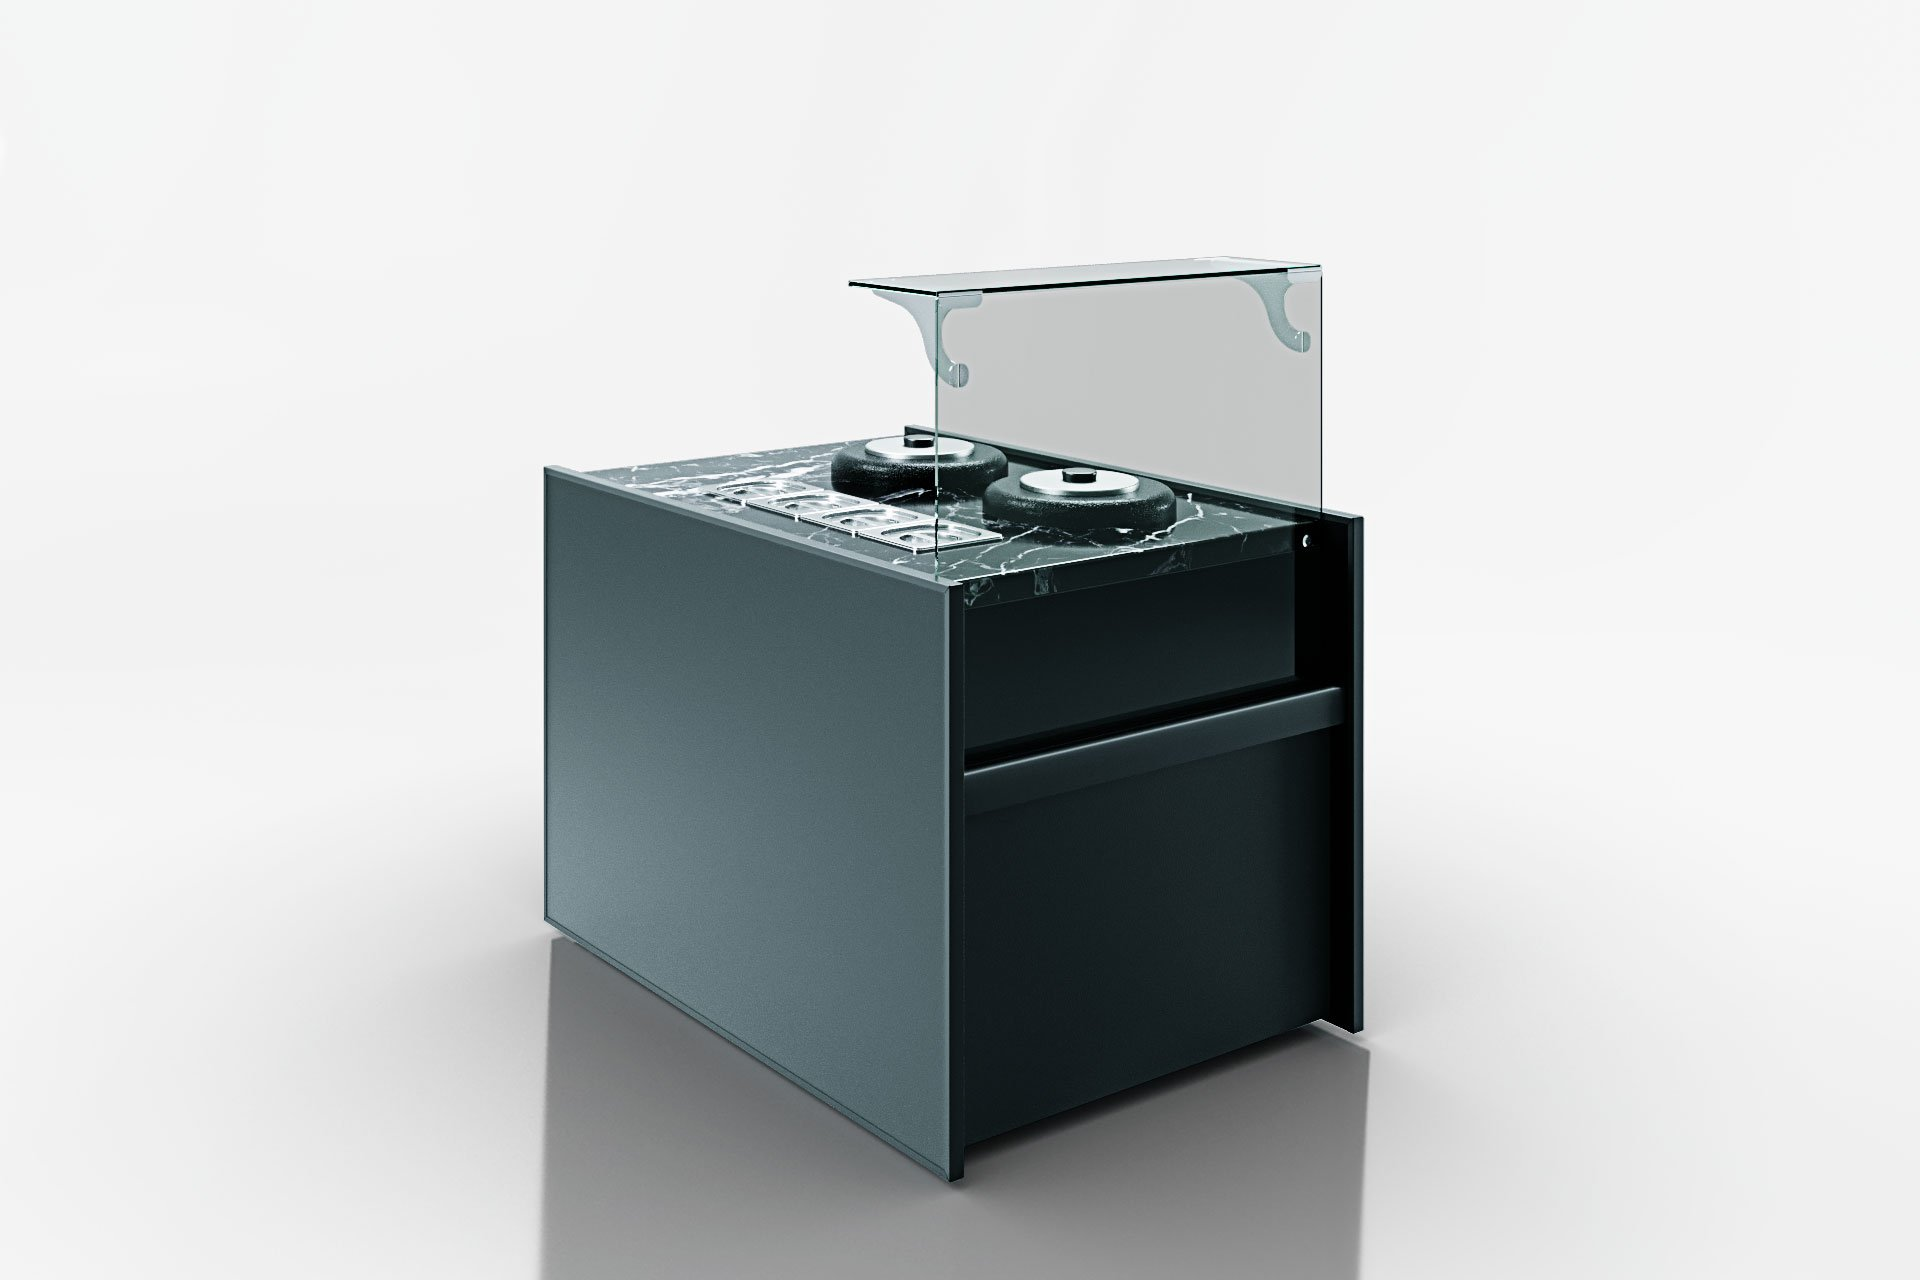 Refrigerated counters Missouri NC 120 tureen L 130